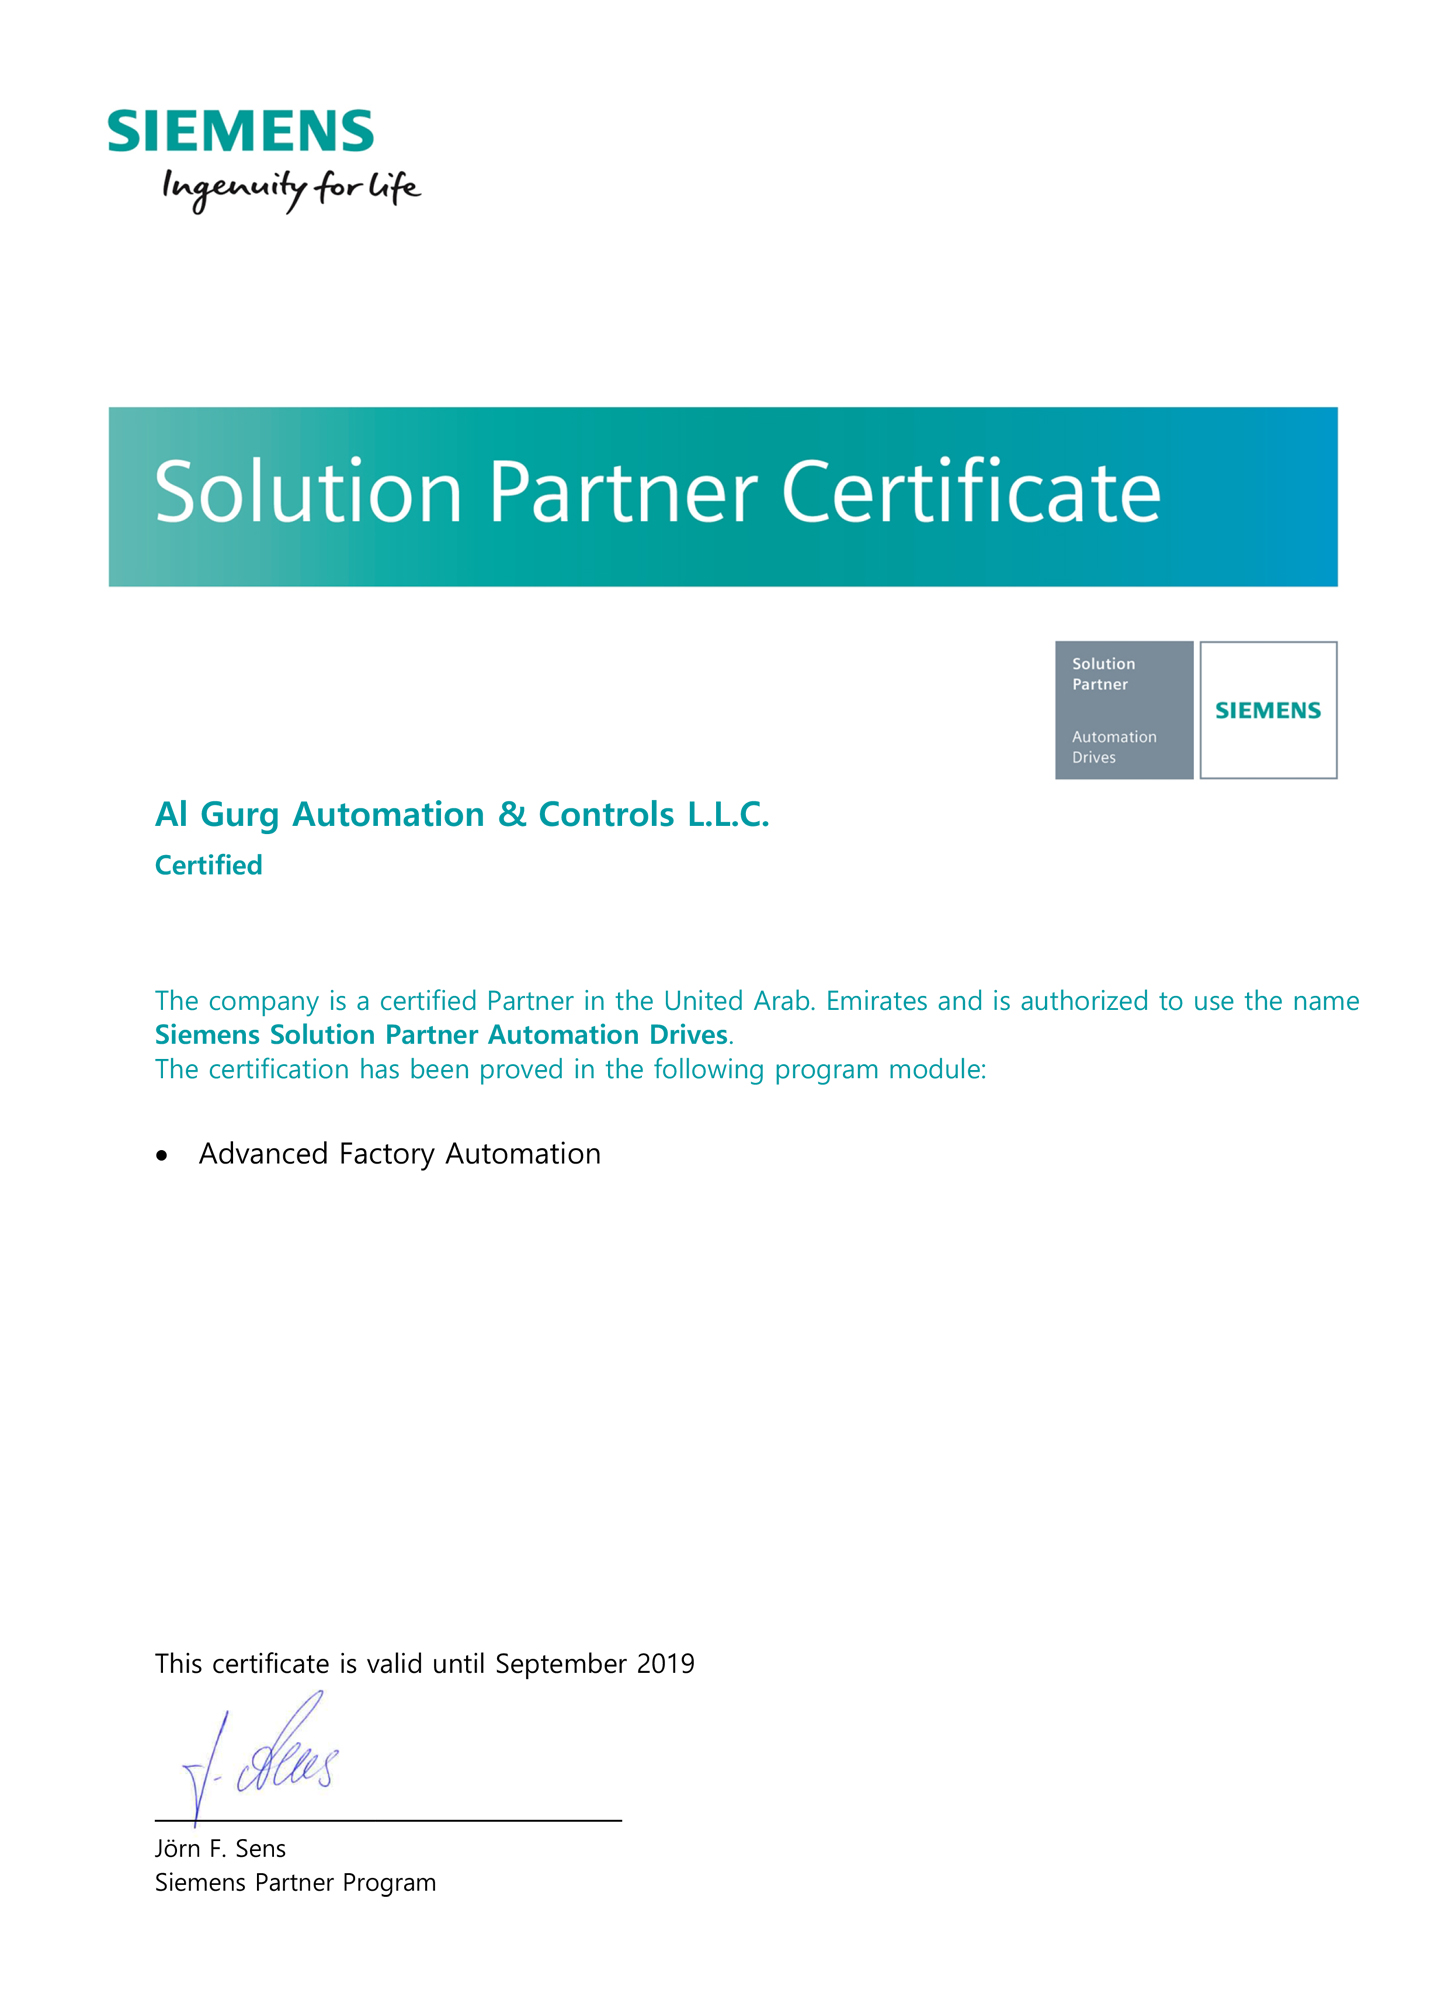 Siemens solutions partner - Thumbnail.jpg